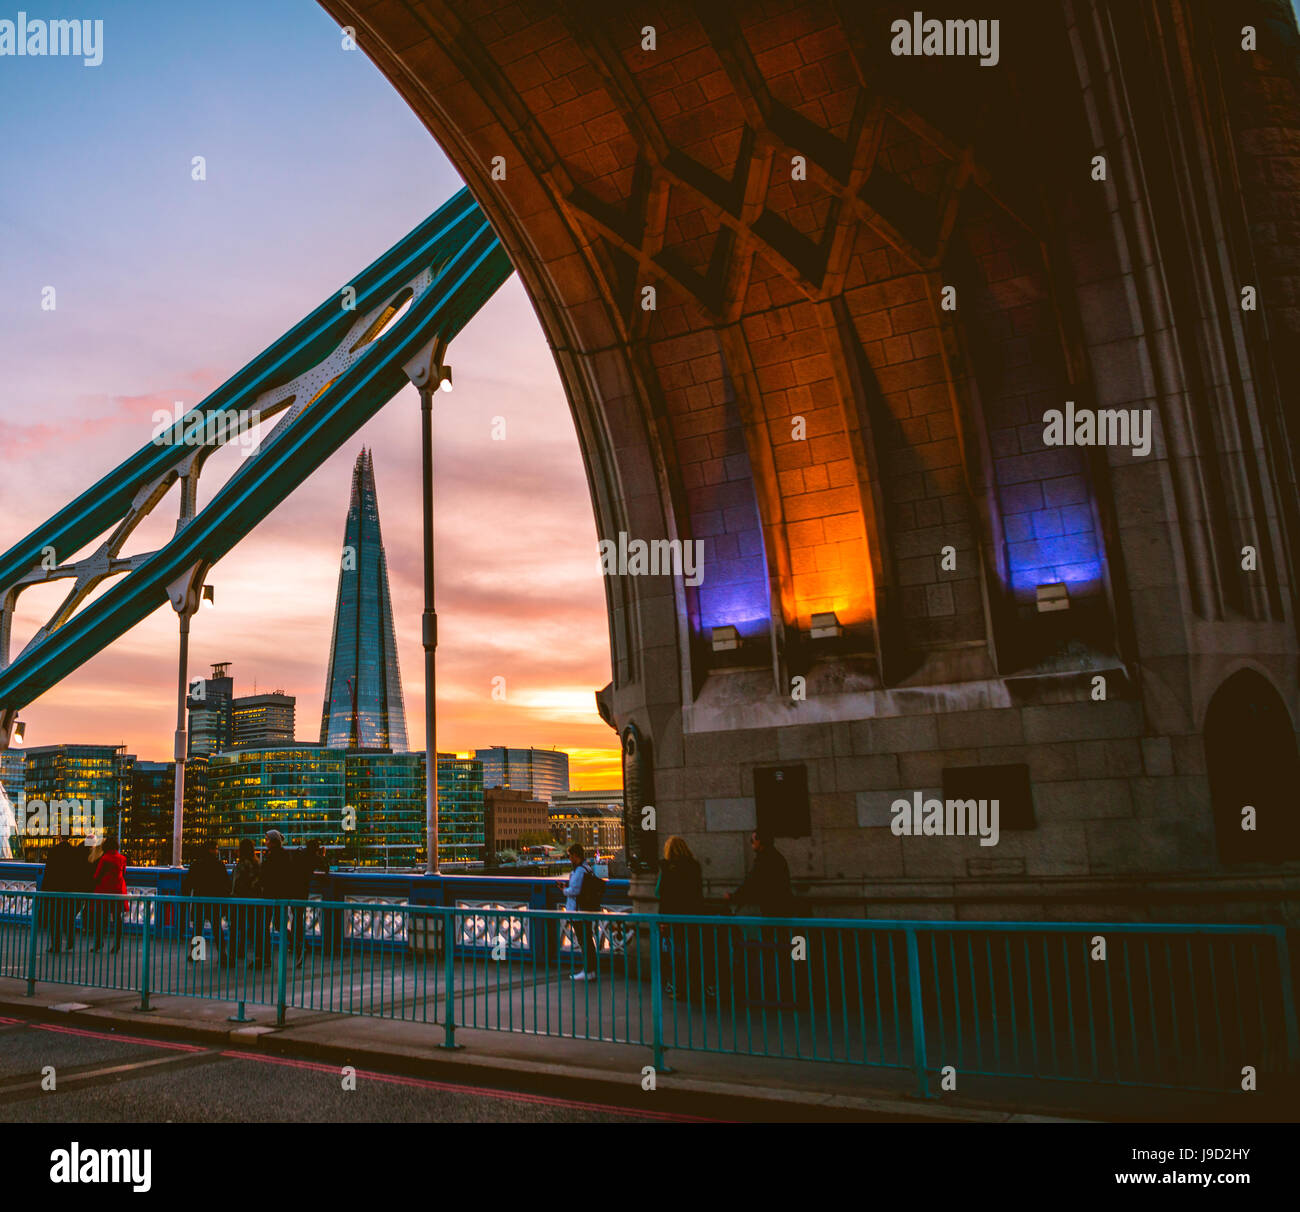 Tower Bridge, view through the gate on The Shard, at sunset, Southwark, London, England, United Kingdom - Stock Image